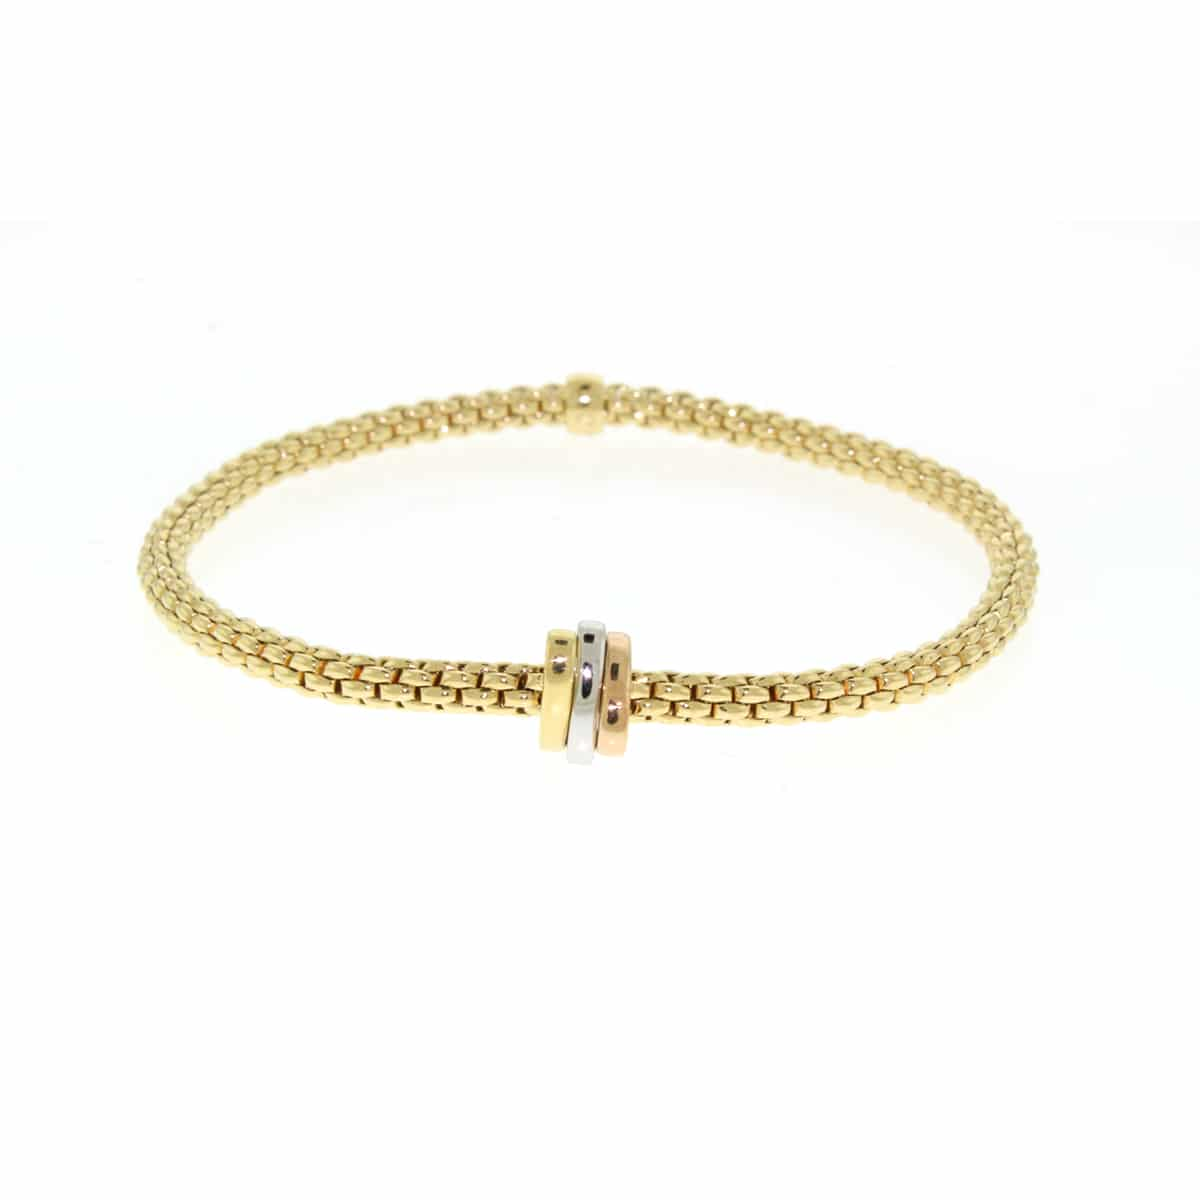 Fope 18k Yellow Gold Flex' It Bracelet with Three Plain Rondels